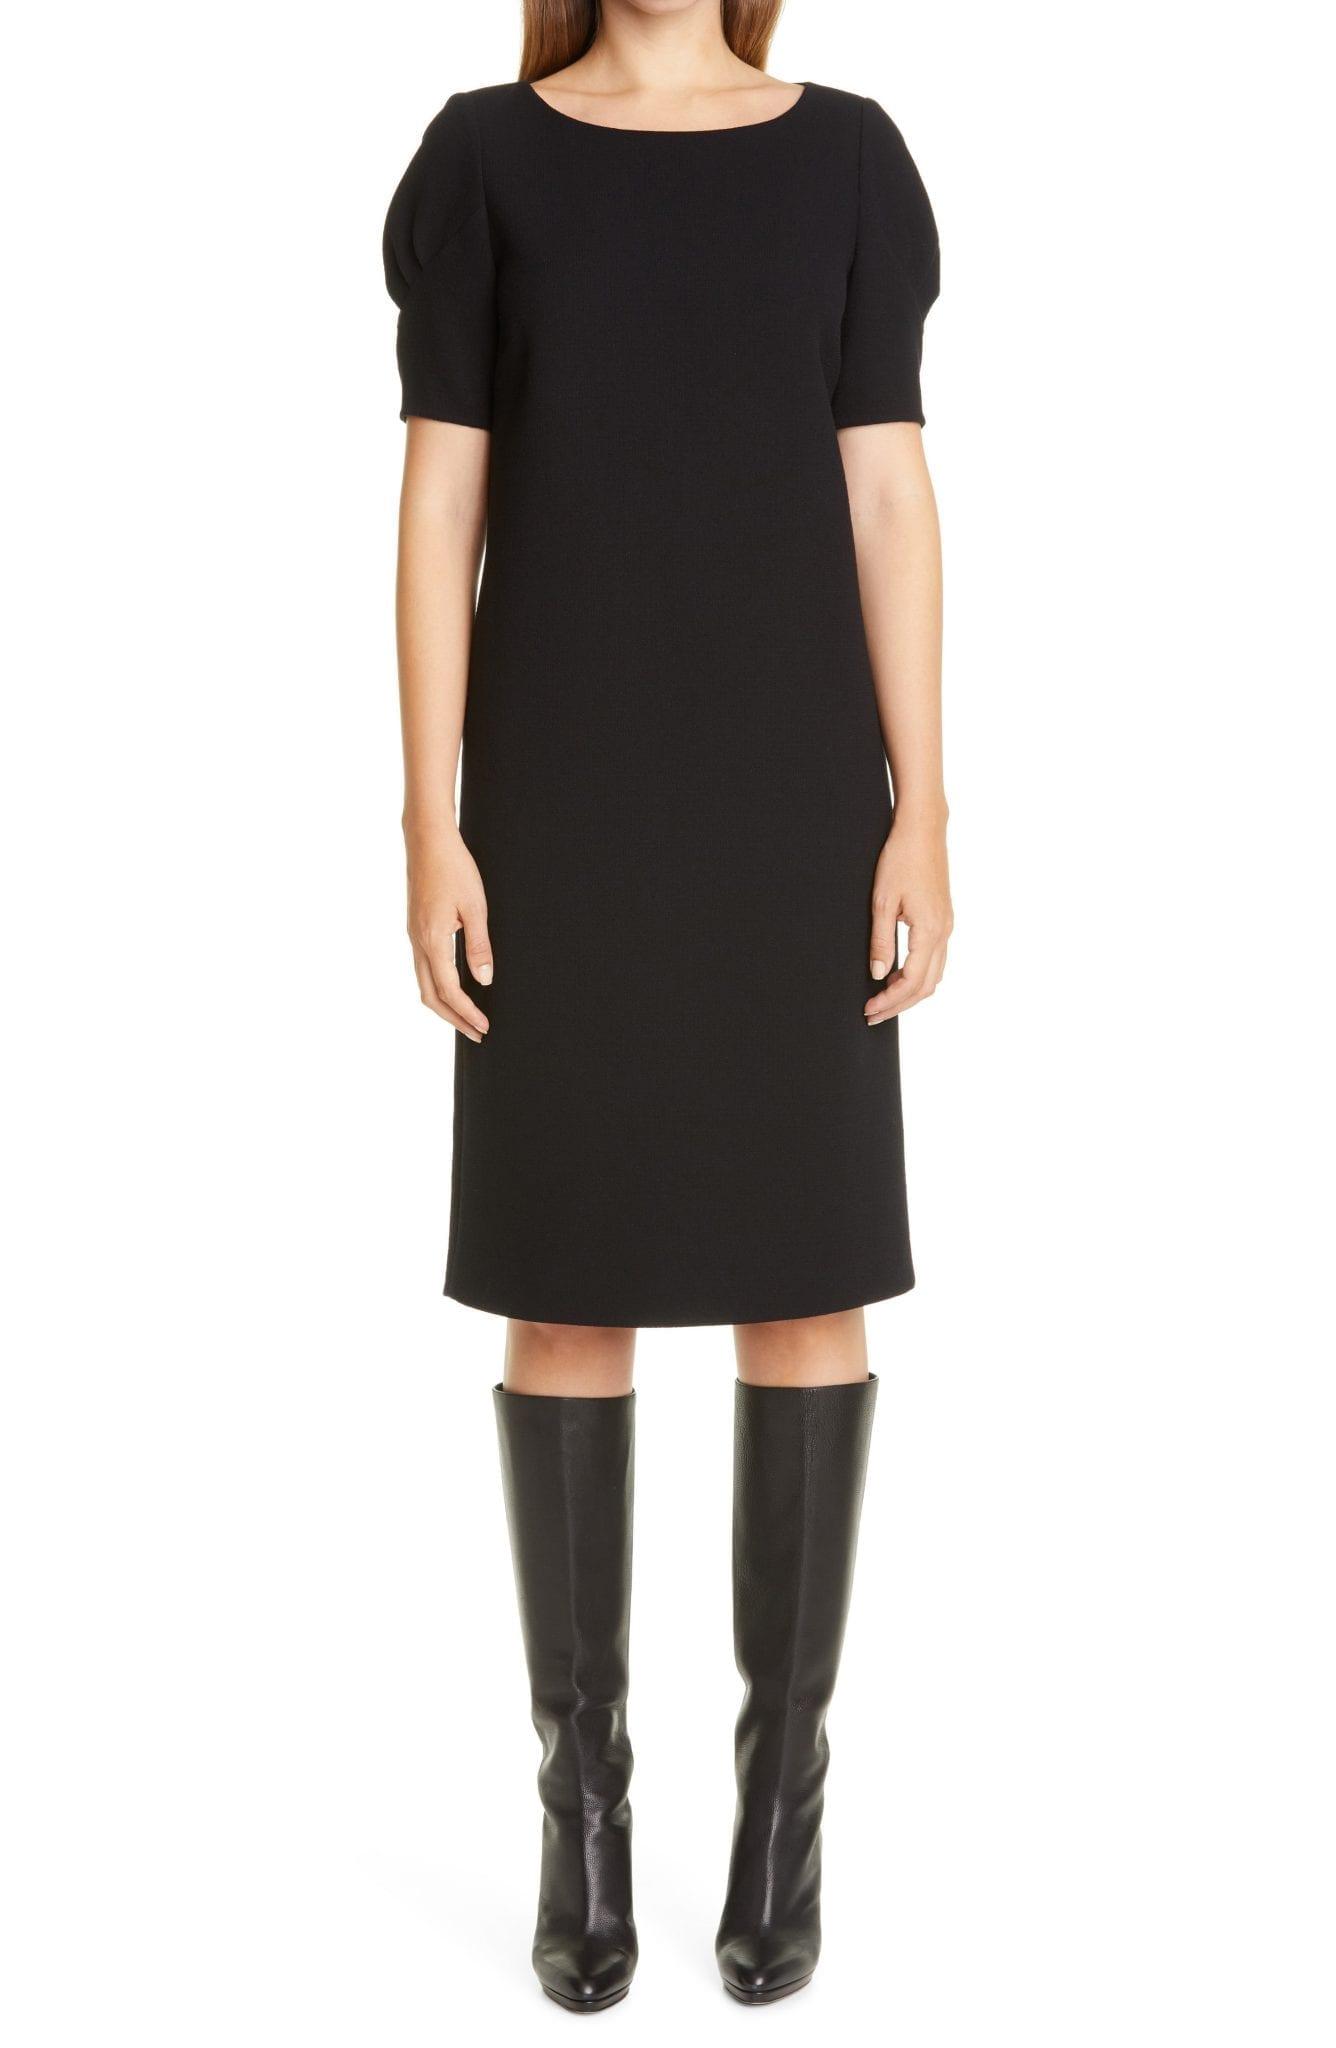 LAFAYETTE 148 NEW YORK Milena Nouveau Wool Crepe Shift Dress